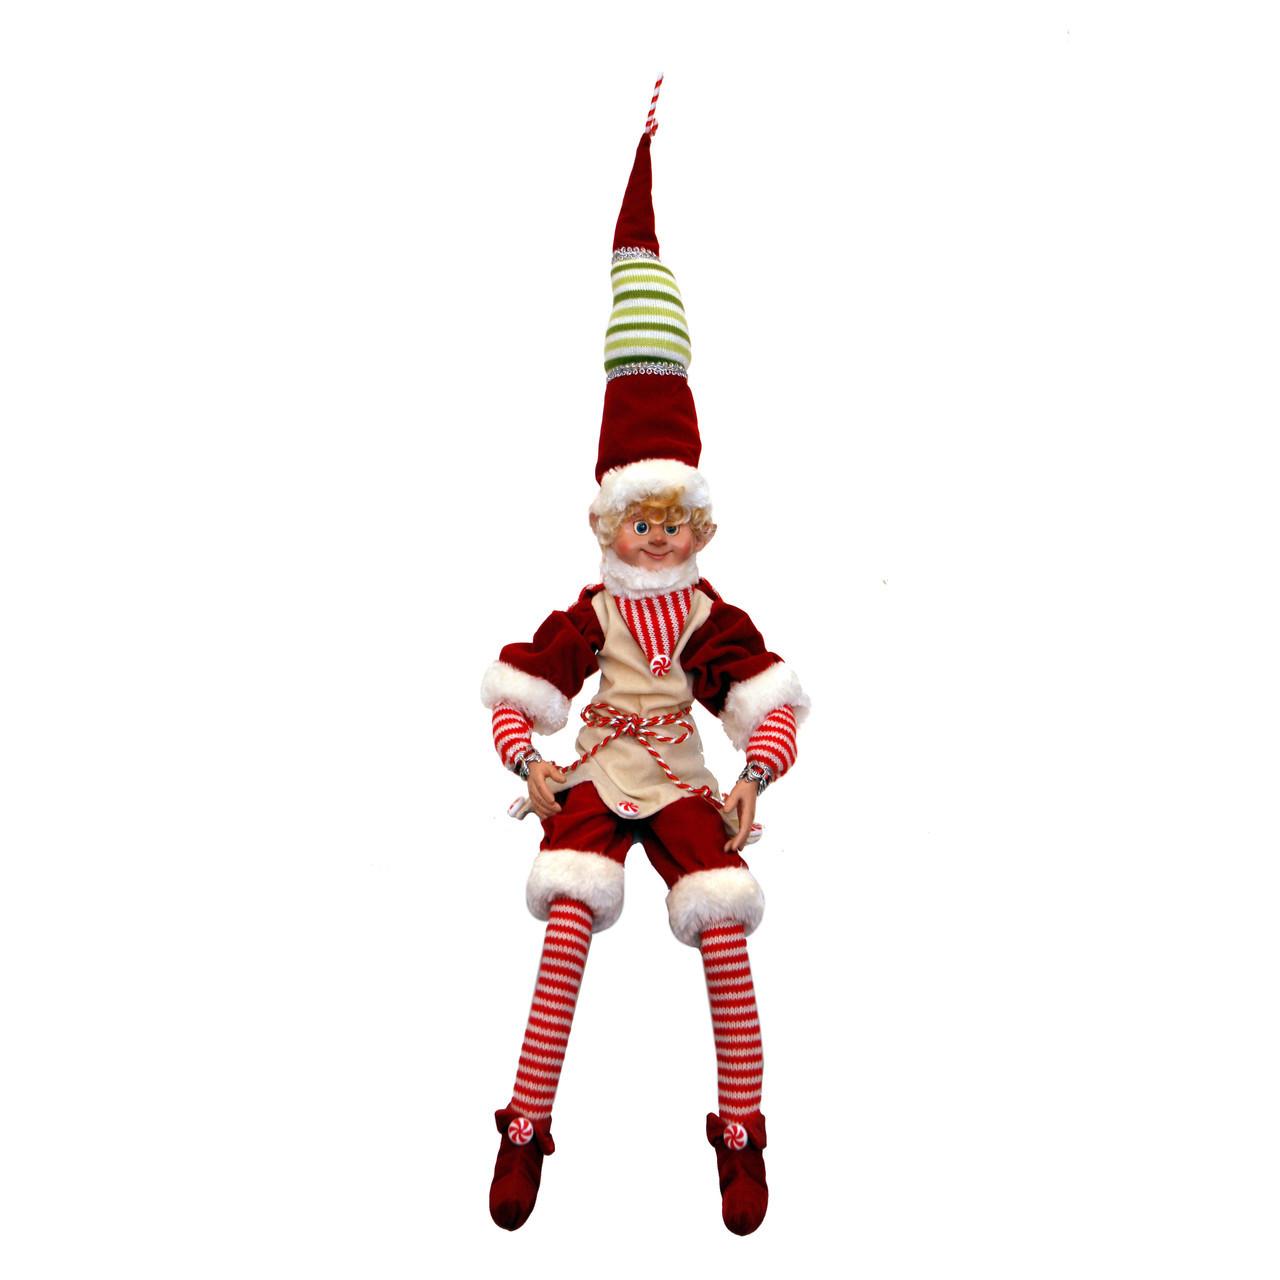 465148351bb43 Floridus Design 16in Buddy the Elf  XN508500